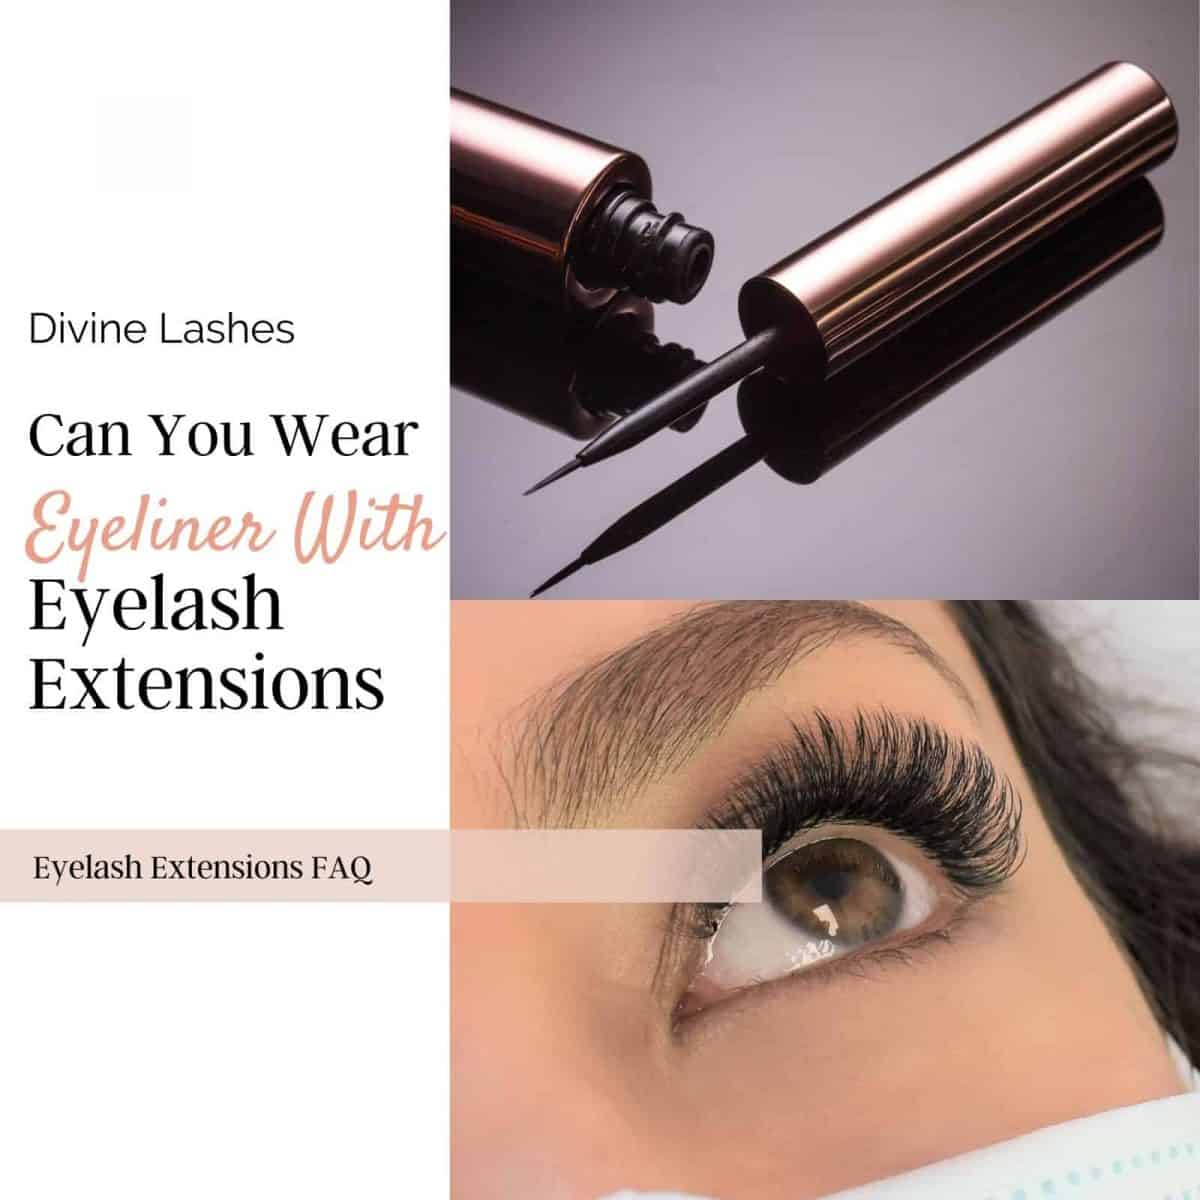 Woman wearing eyeliner with eyelash extensions